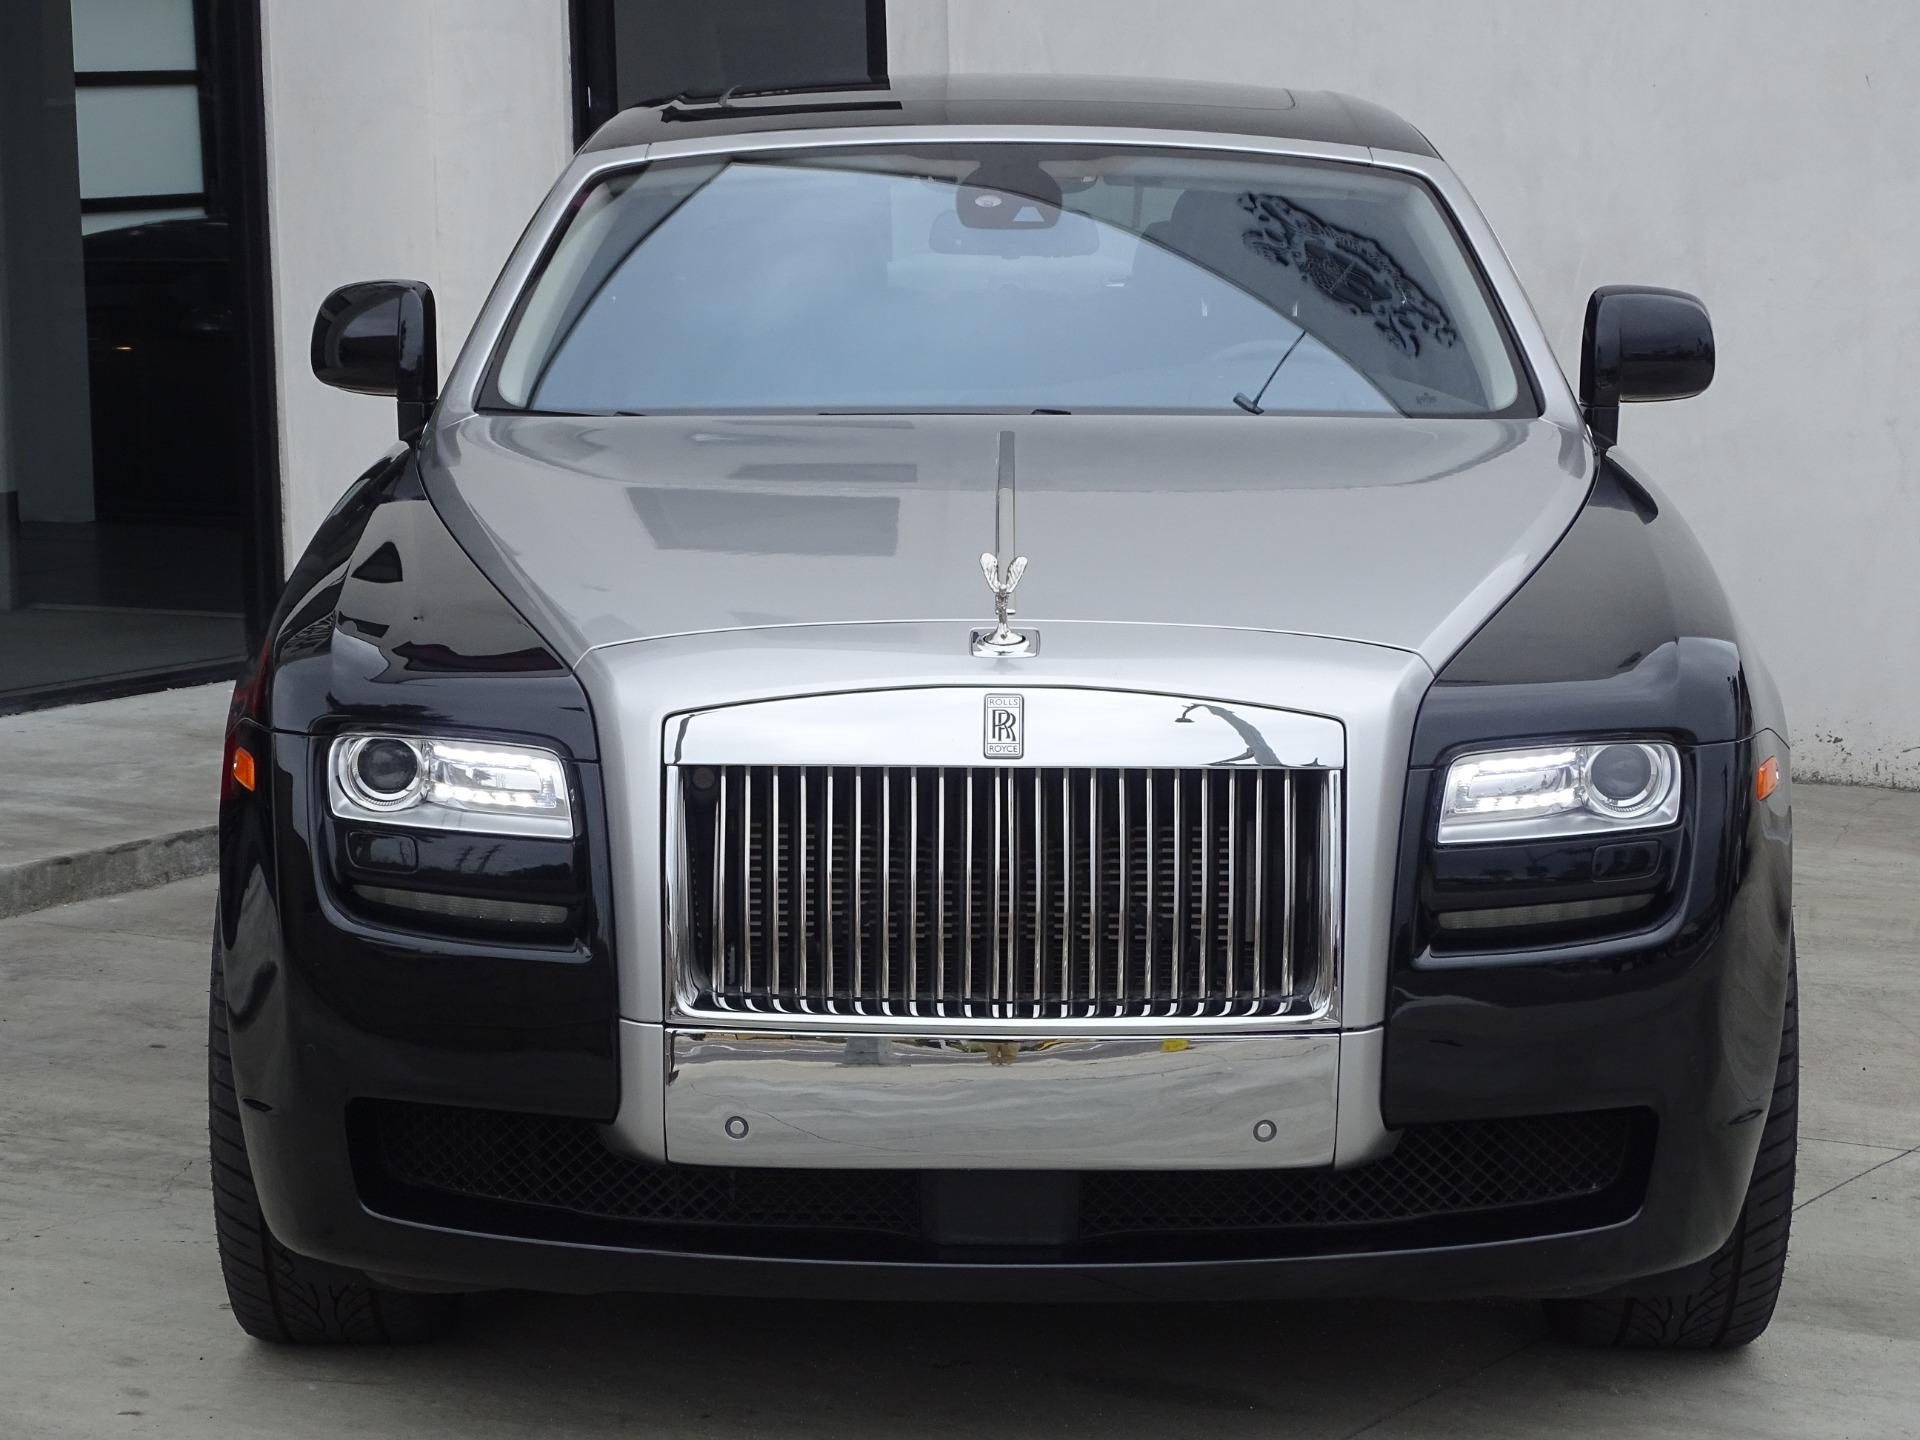 Used-2010-Rolls-Royce-Ghost